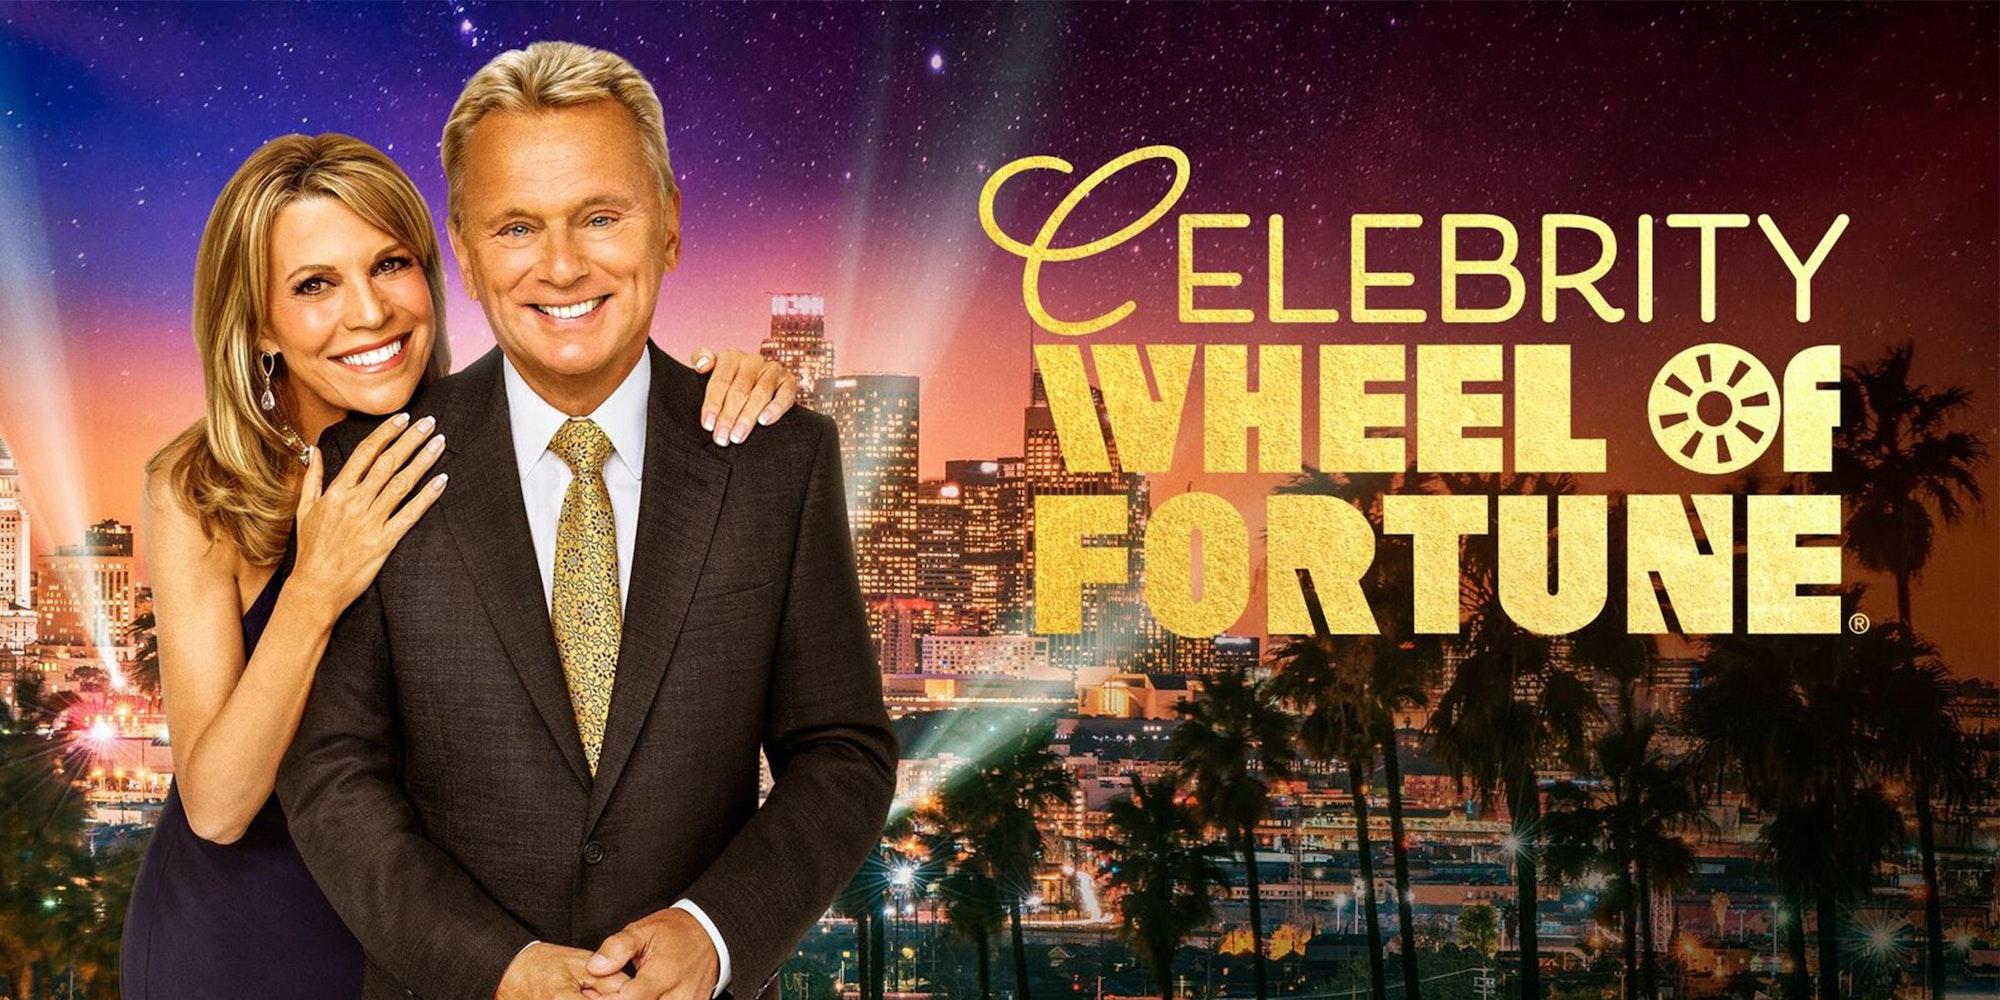 stream celebrity wheel of fortune